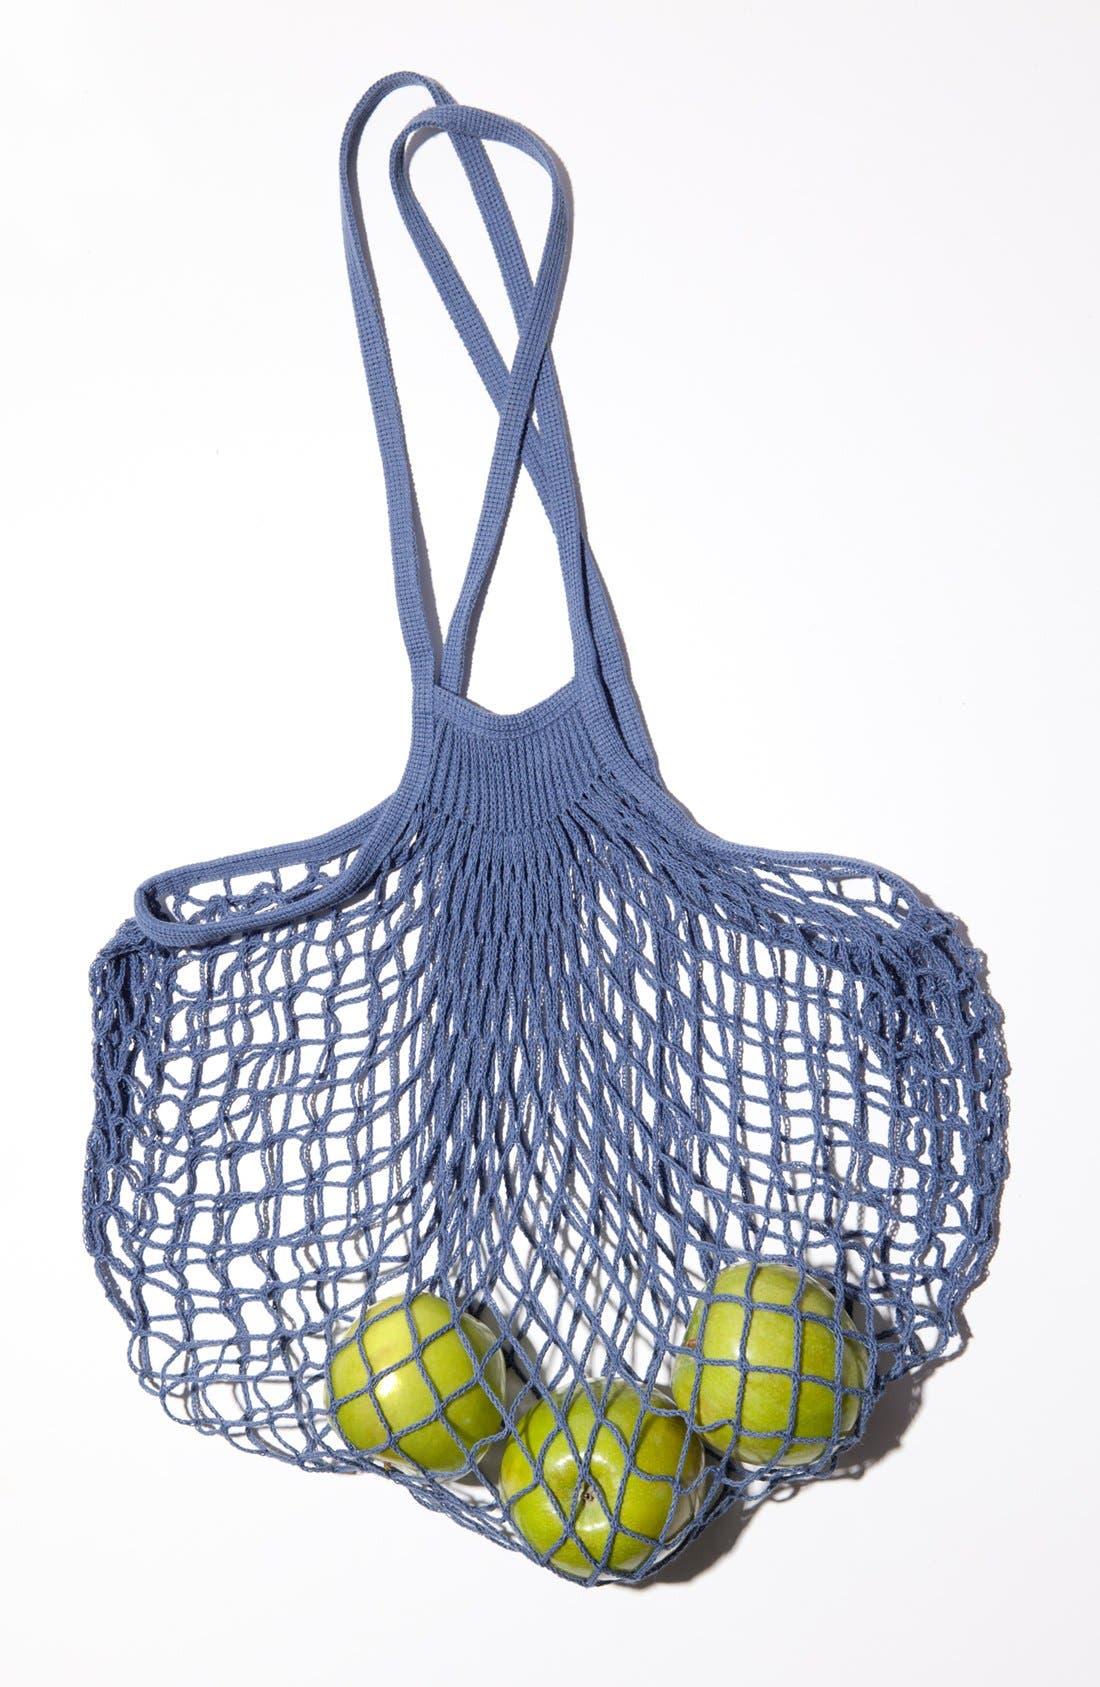 Alternate Image 2 Selected - Merci 'Filet à Provision' Bleu Net Shopping Bag